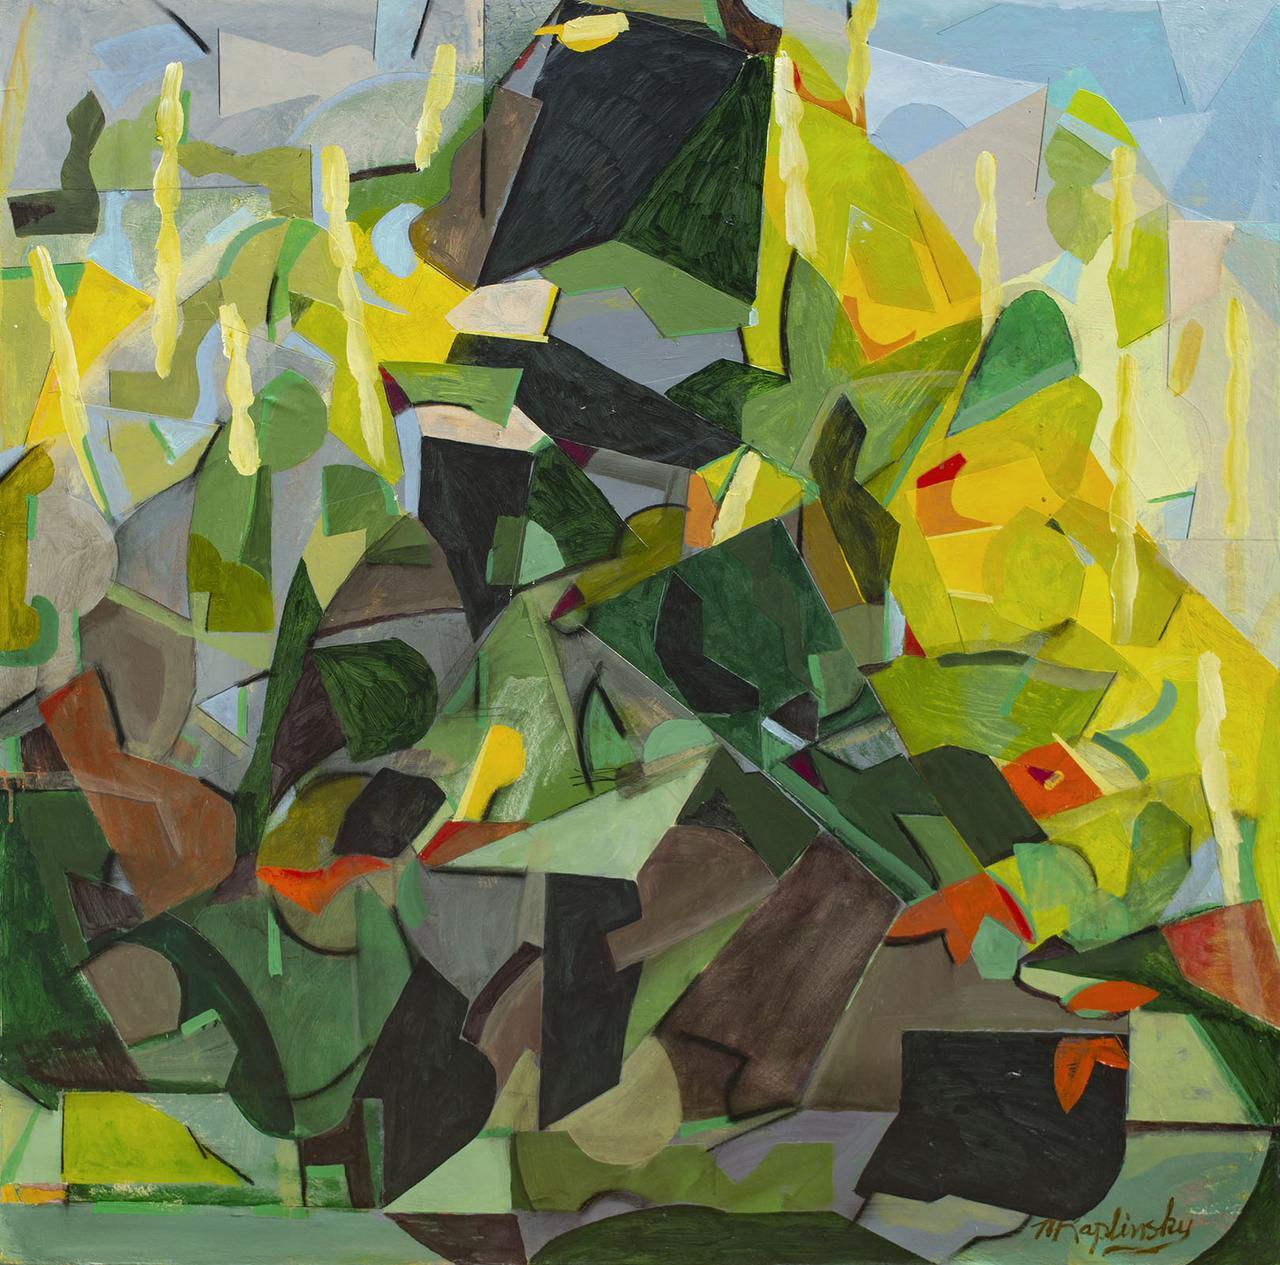 wax myrtle _48x48 _acrylic and paper on canvas _by matt kaplinsky _web.jpg